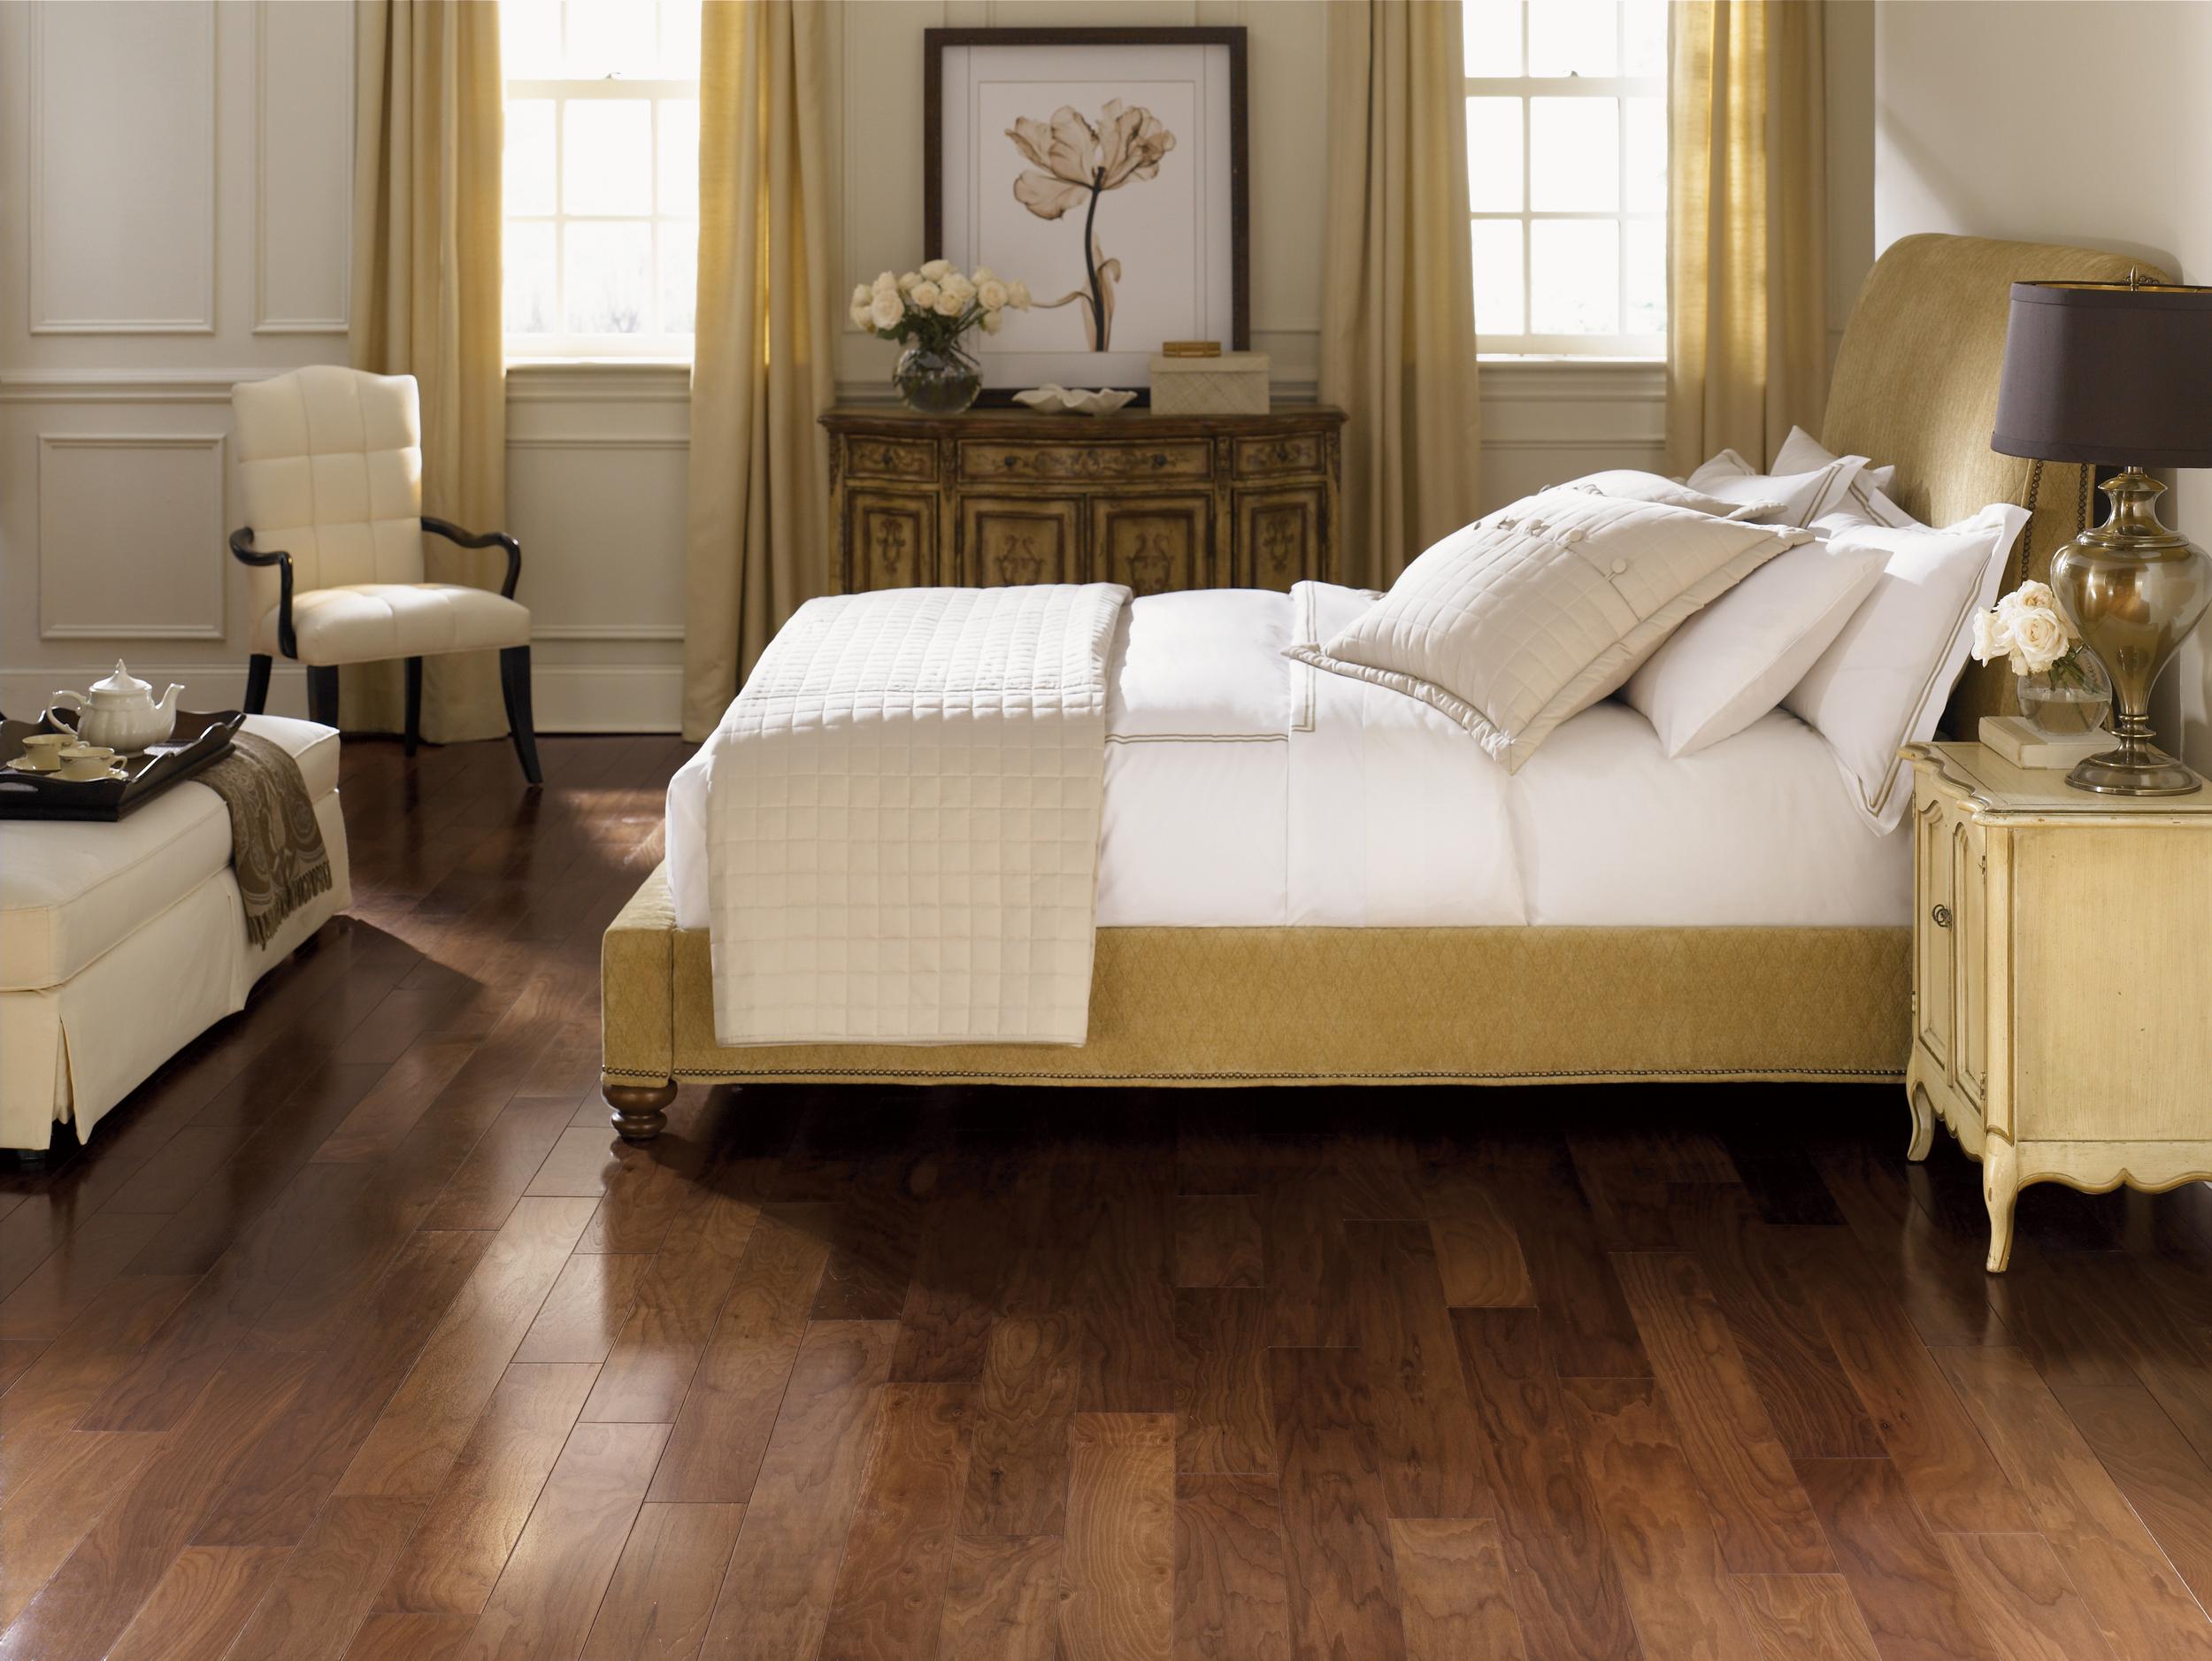 Mohawk hardwood floor